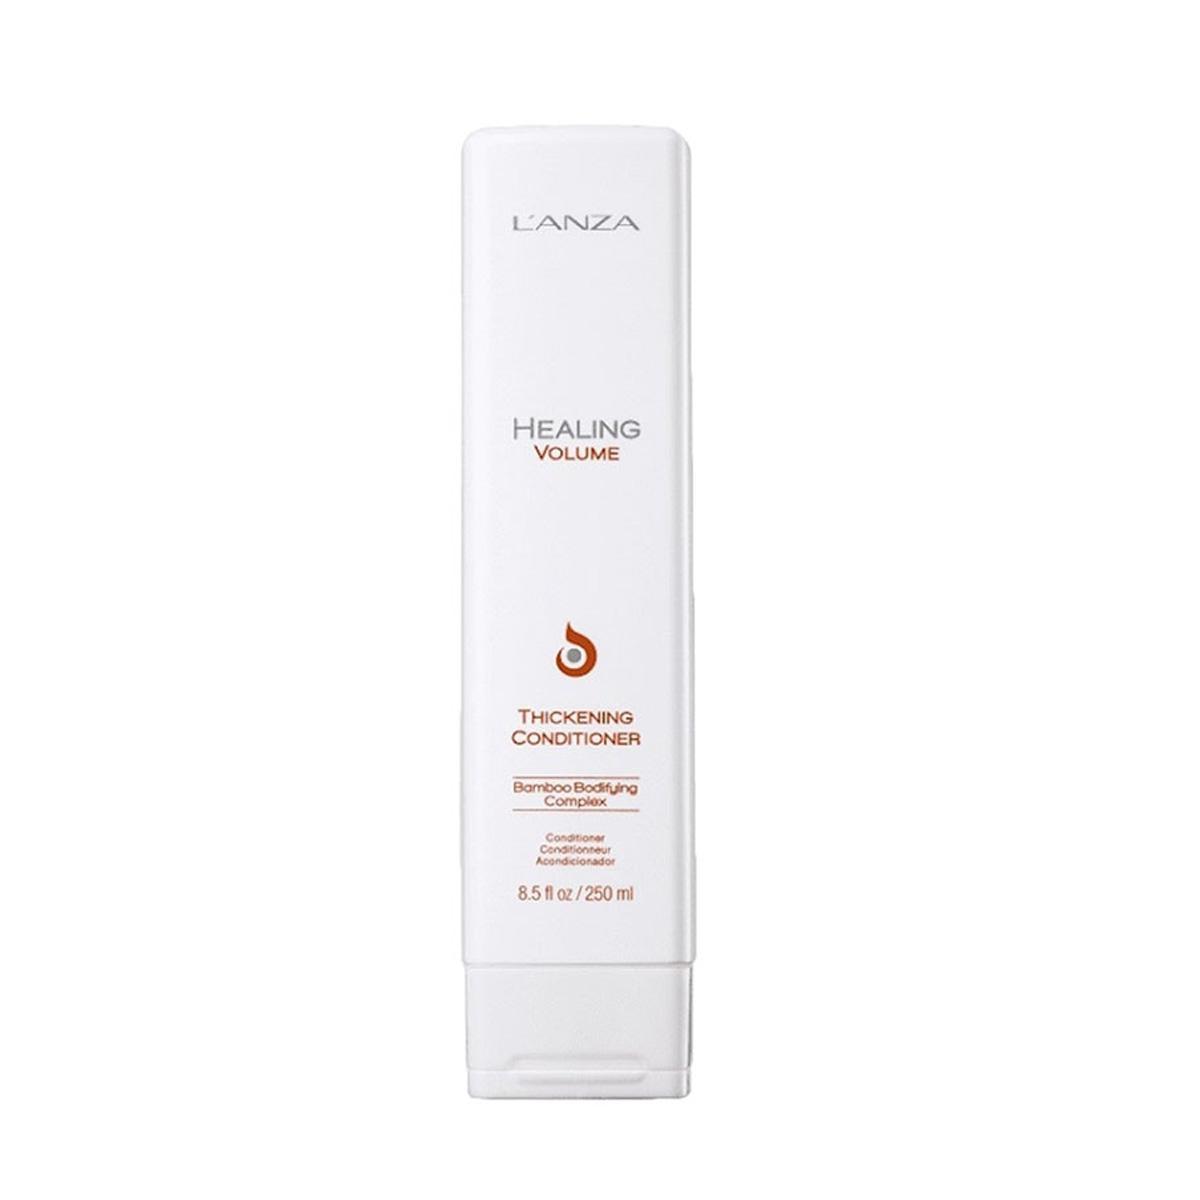 Lanza Healing Volume Thickening Condicionador - 250ml